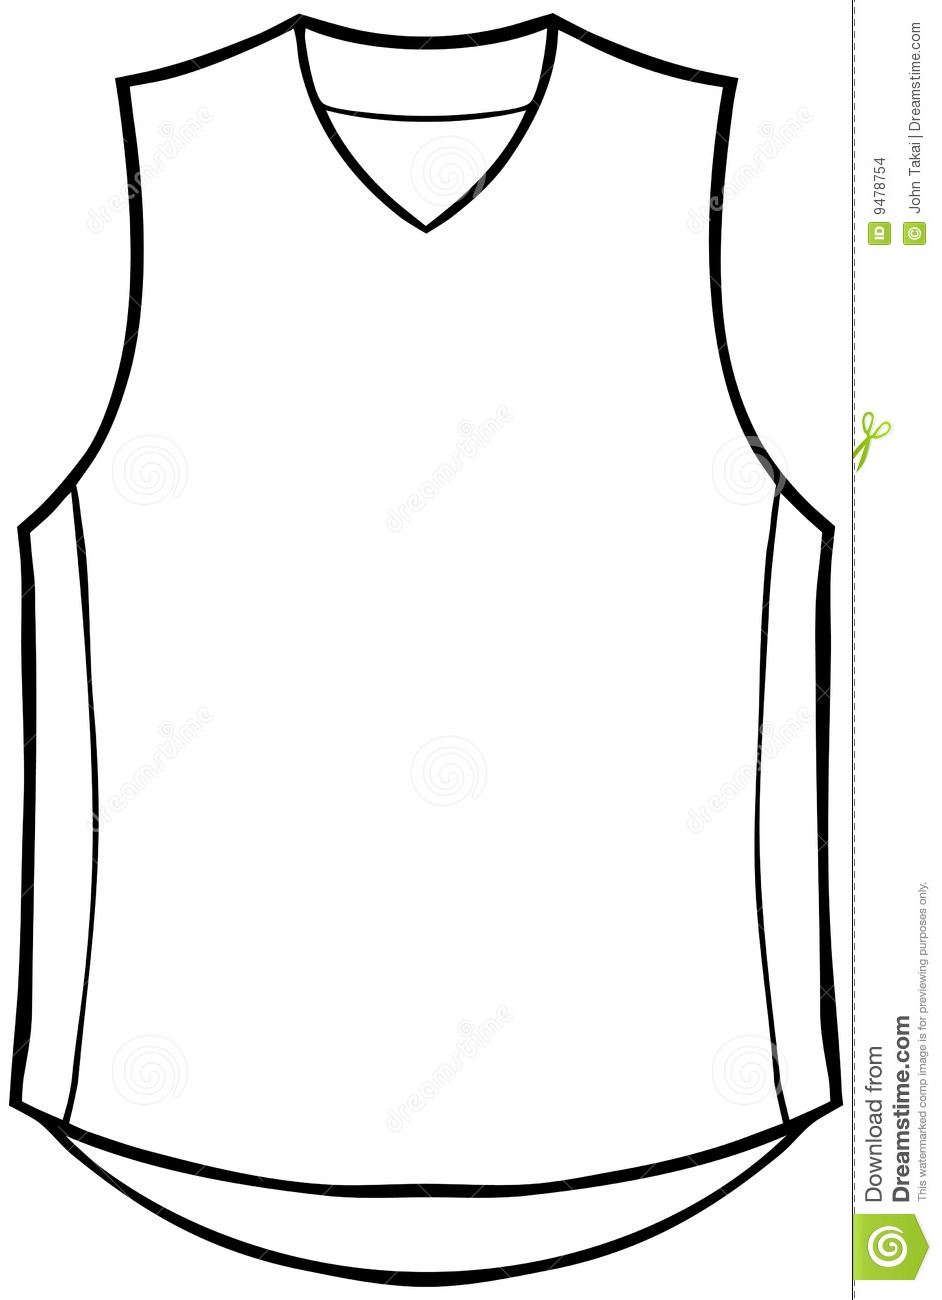 667e76d607d Basketball Jersey Clipart & Look At Clip Art Images - ClipartLook